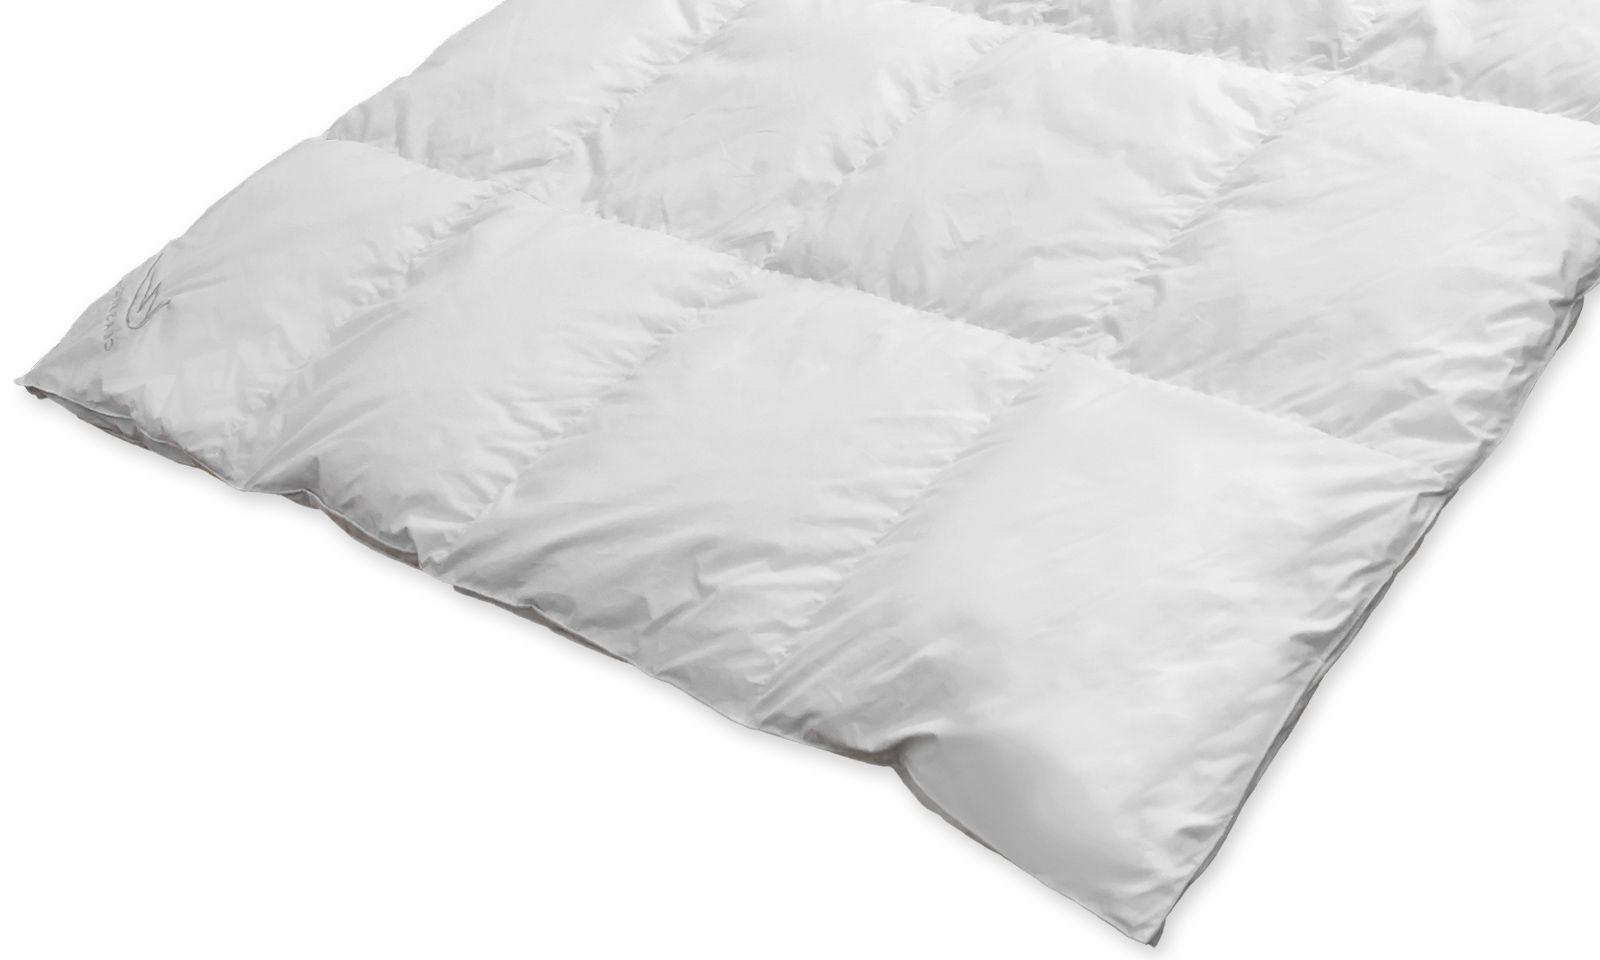 daunendecke extra warm 200x200 daunen kissen decken pinterest decken. Black Bedroom Furniture Sets. Home Design Ideas